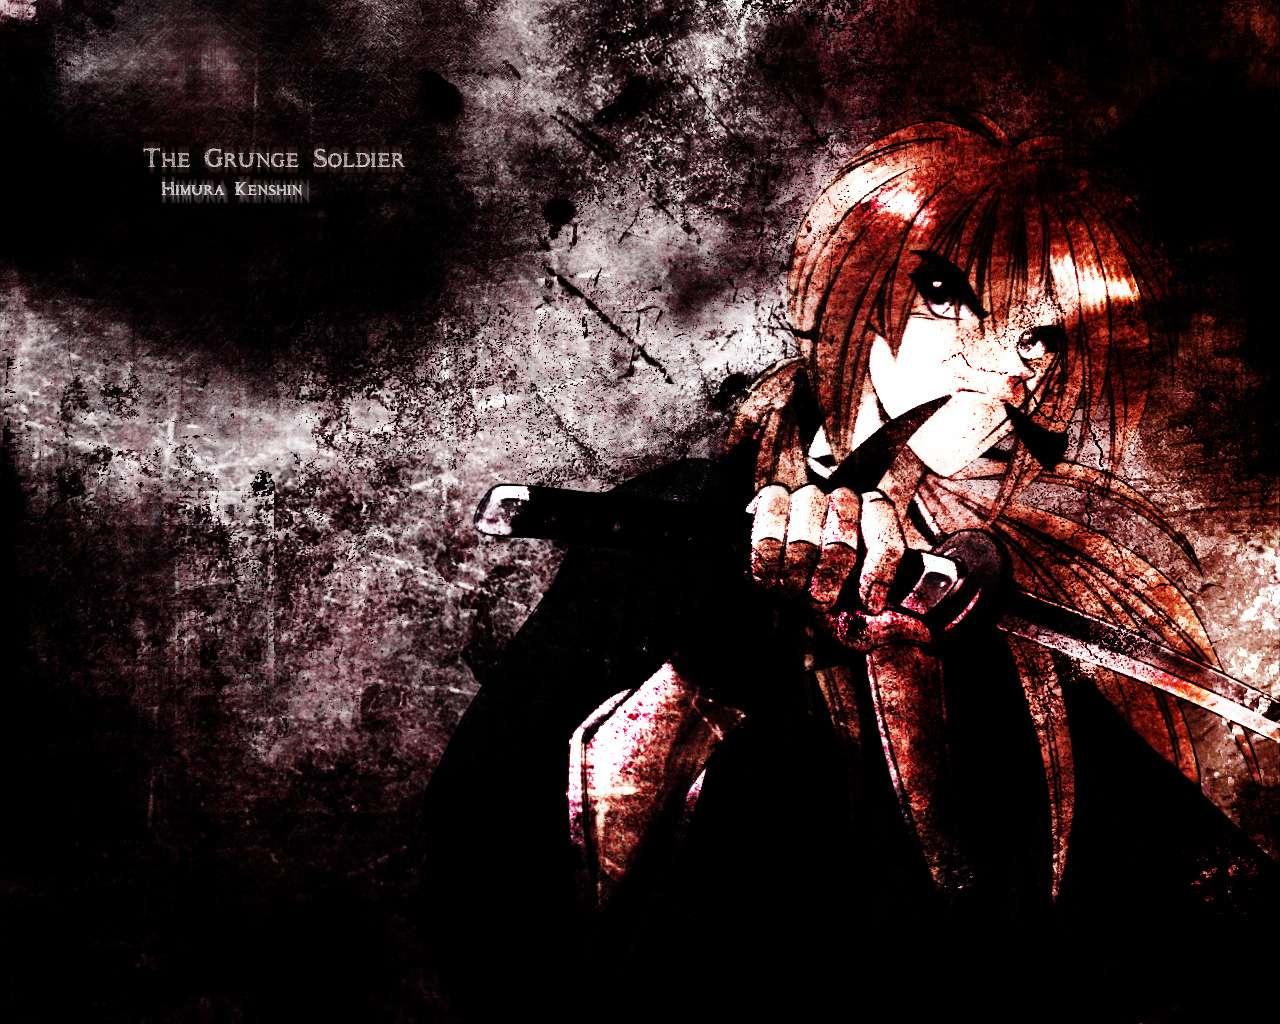 http://2.bp.blogspot.com/_trRseCaUpbU/S-2Gs7gv5DI/AAAAAAAAAKg/yO1246gO8pQ/s1600/[AnimePaper]wallpapers_Rurouni-Kenshin_Shadow_Dude_2988.jpg